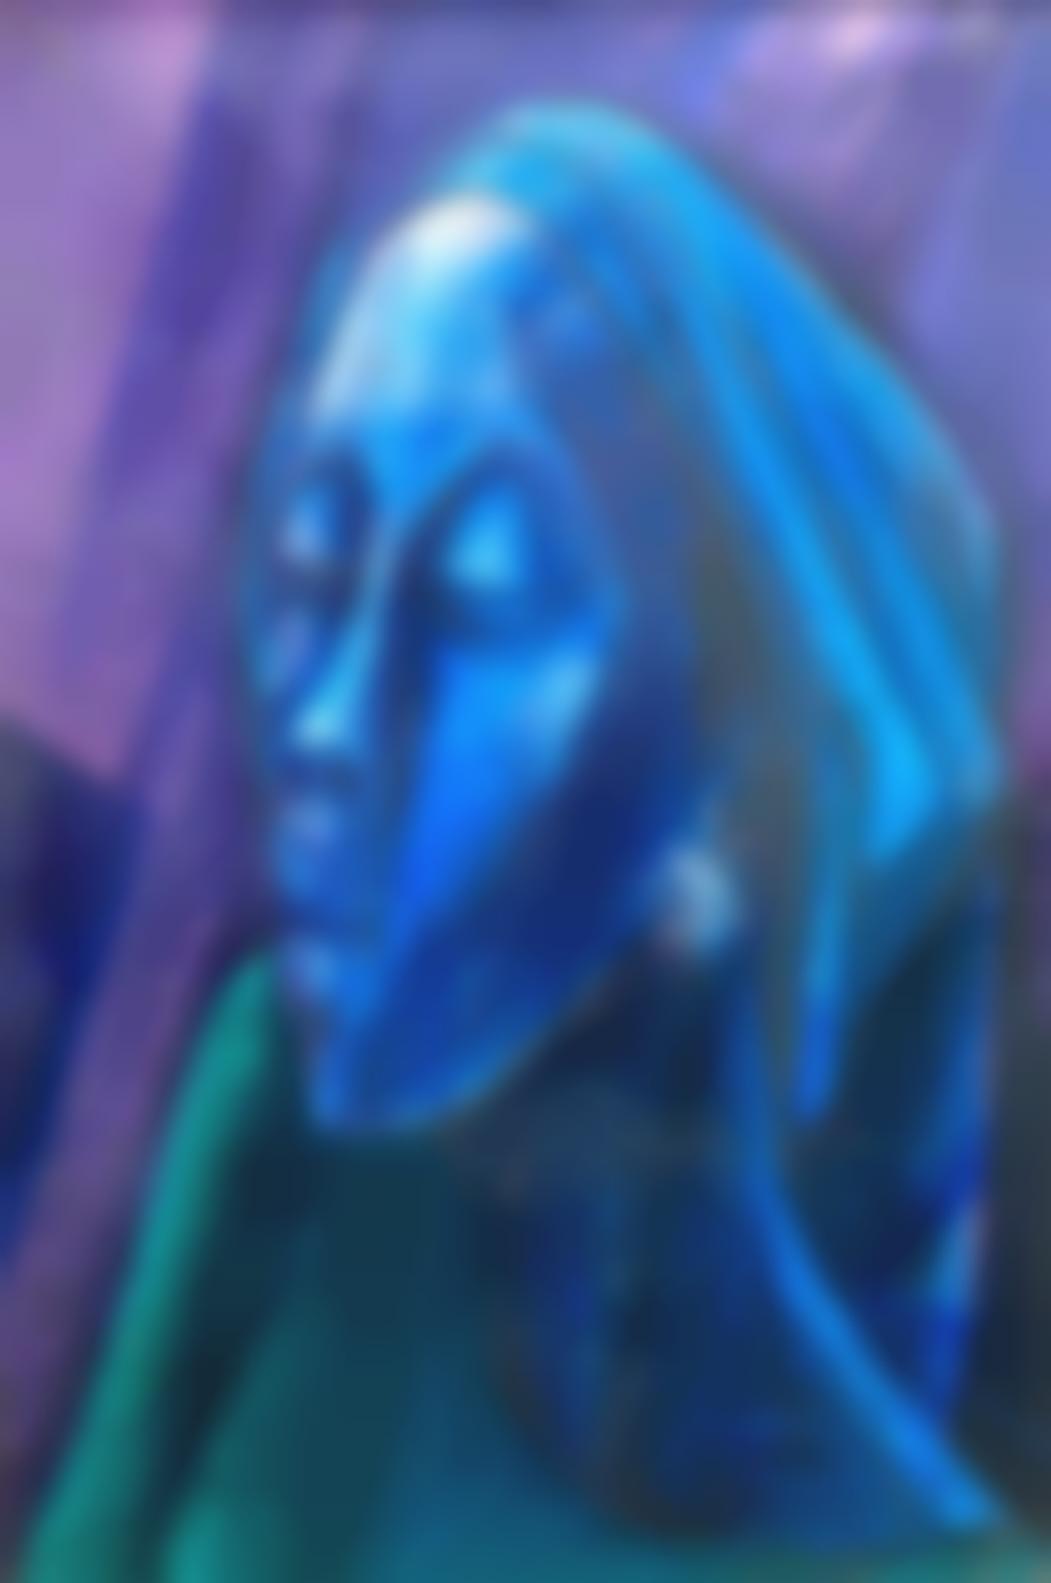 Yusuf Adebayo Cameron Grillo - Woman In Blue-